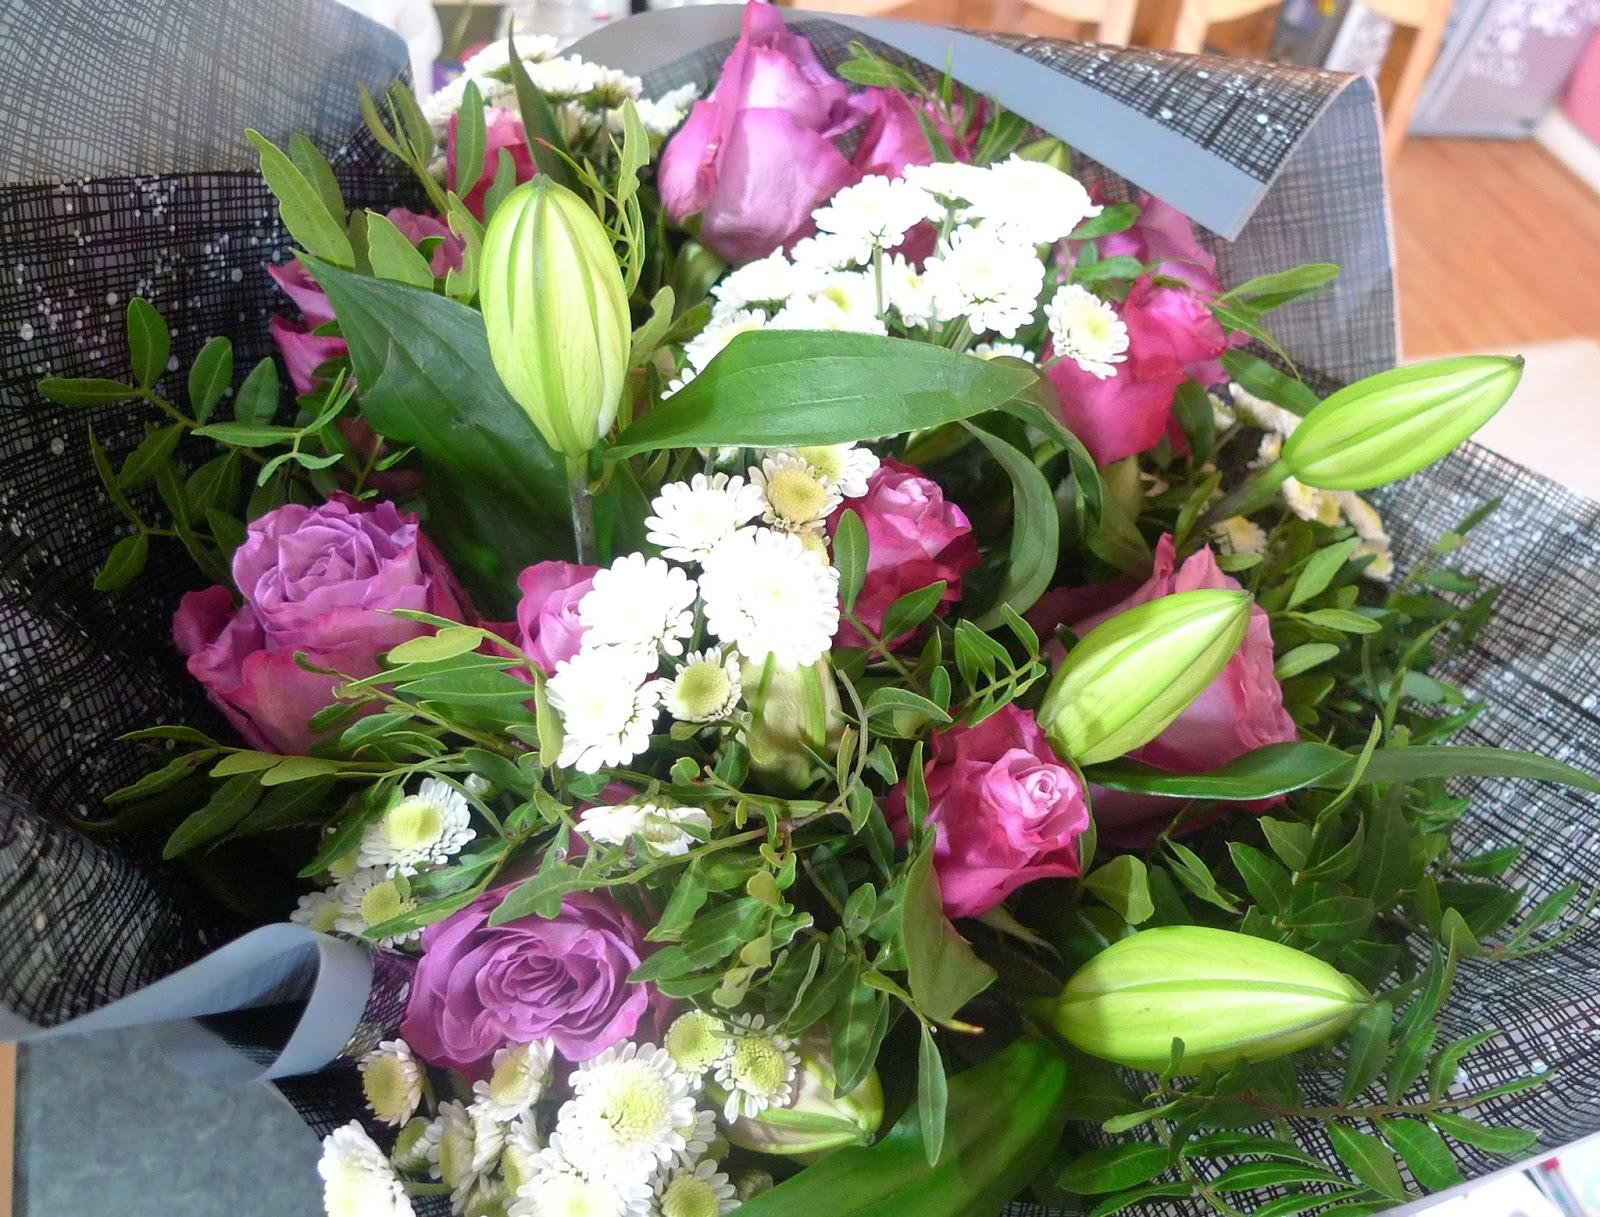 Flower Images 2018 Hour Flower Delivery Flower Images